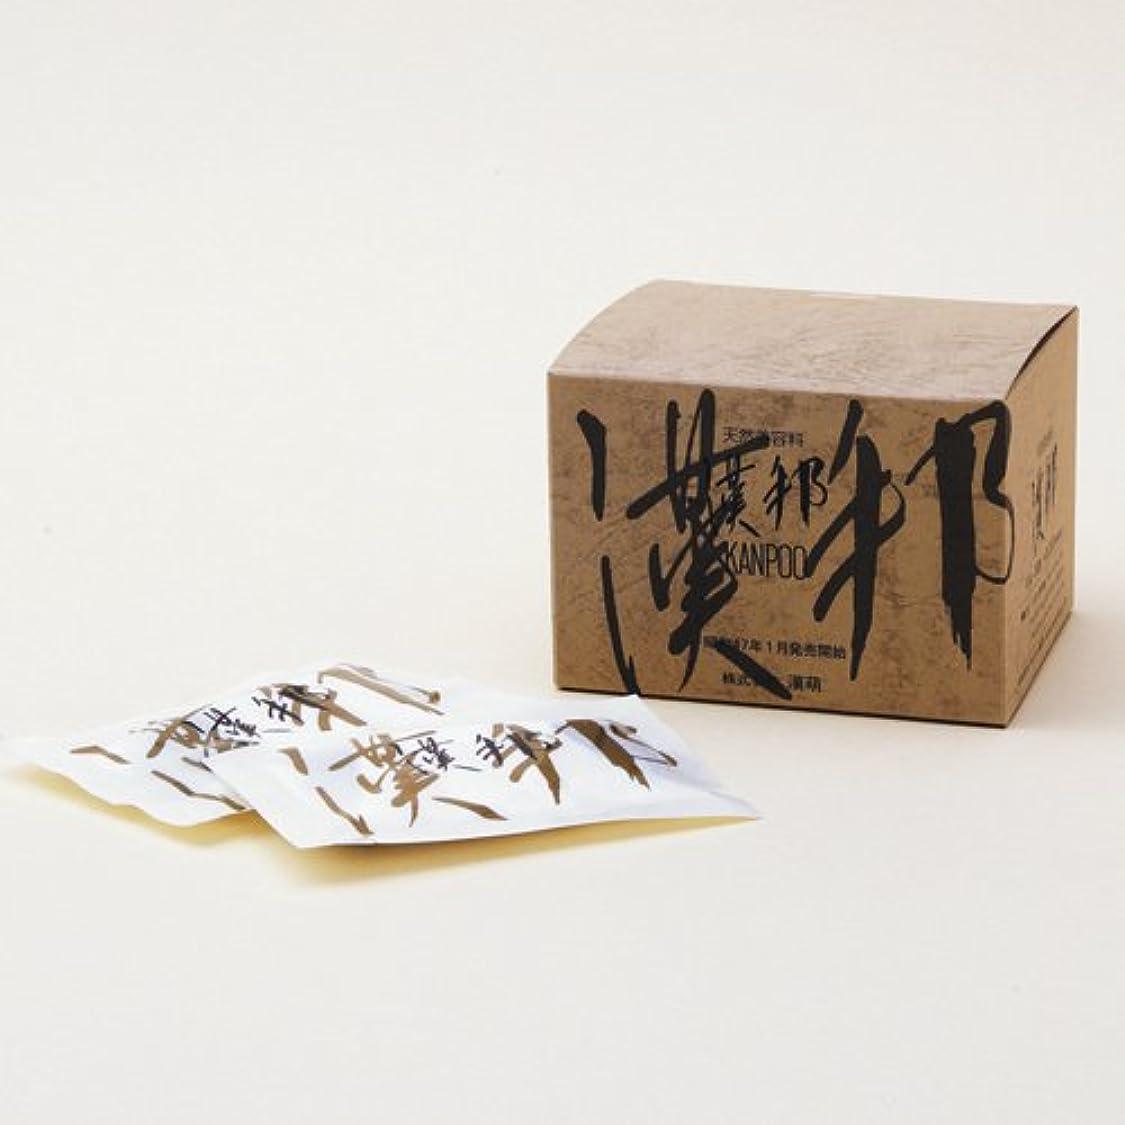 パン屋差別的赤漢萌(KANPOO) 漢邦ぬか袋(全肌活肌料) 熟成12年 10g×16袋